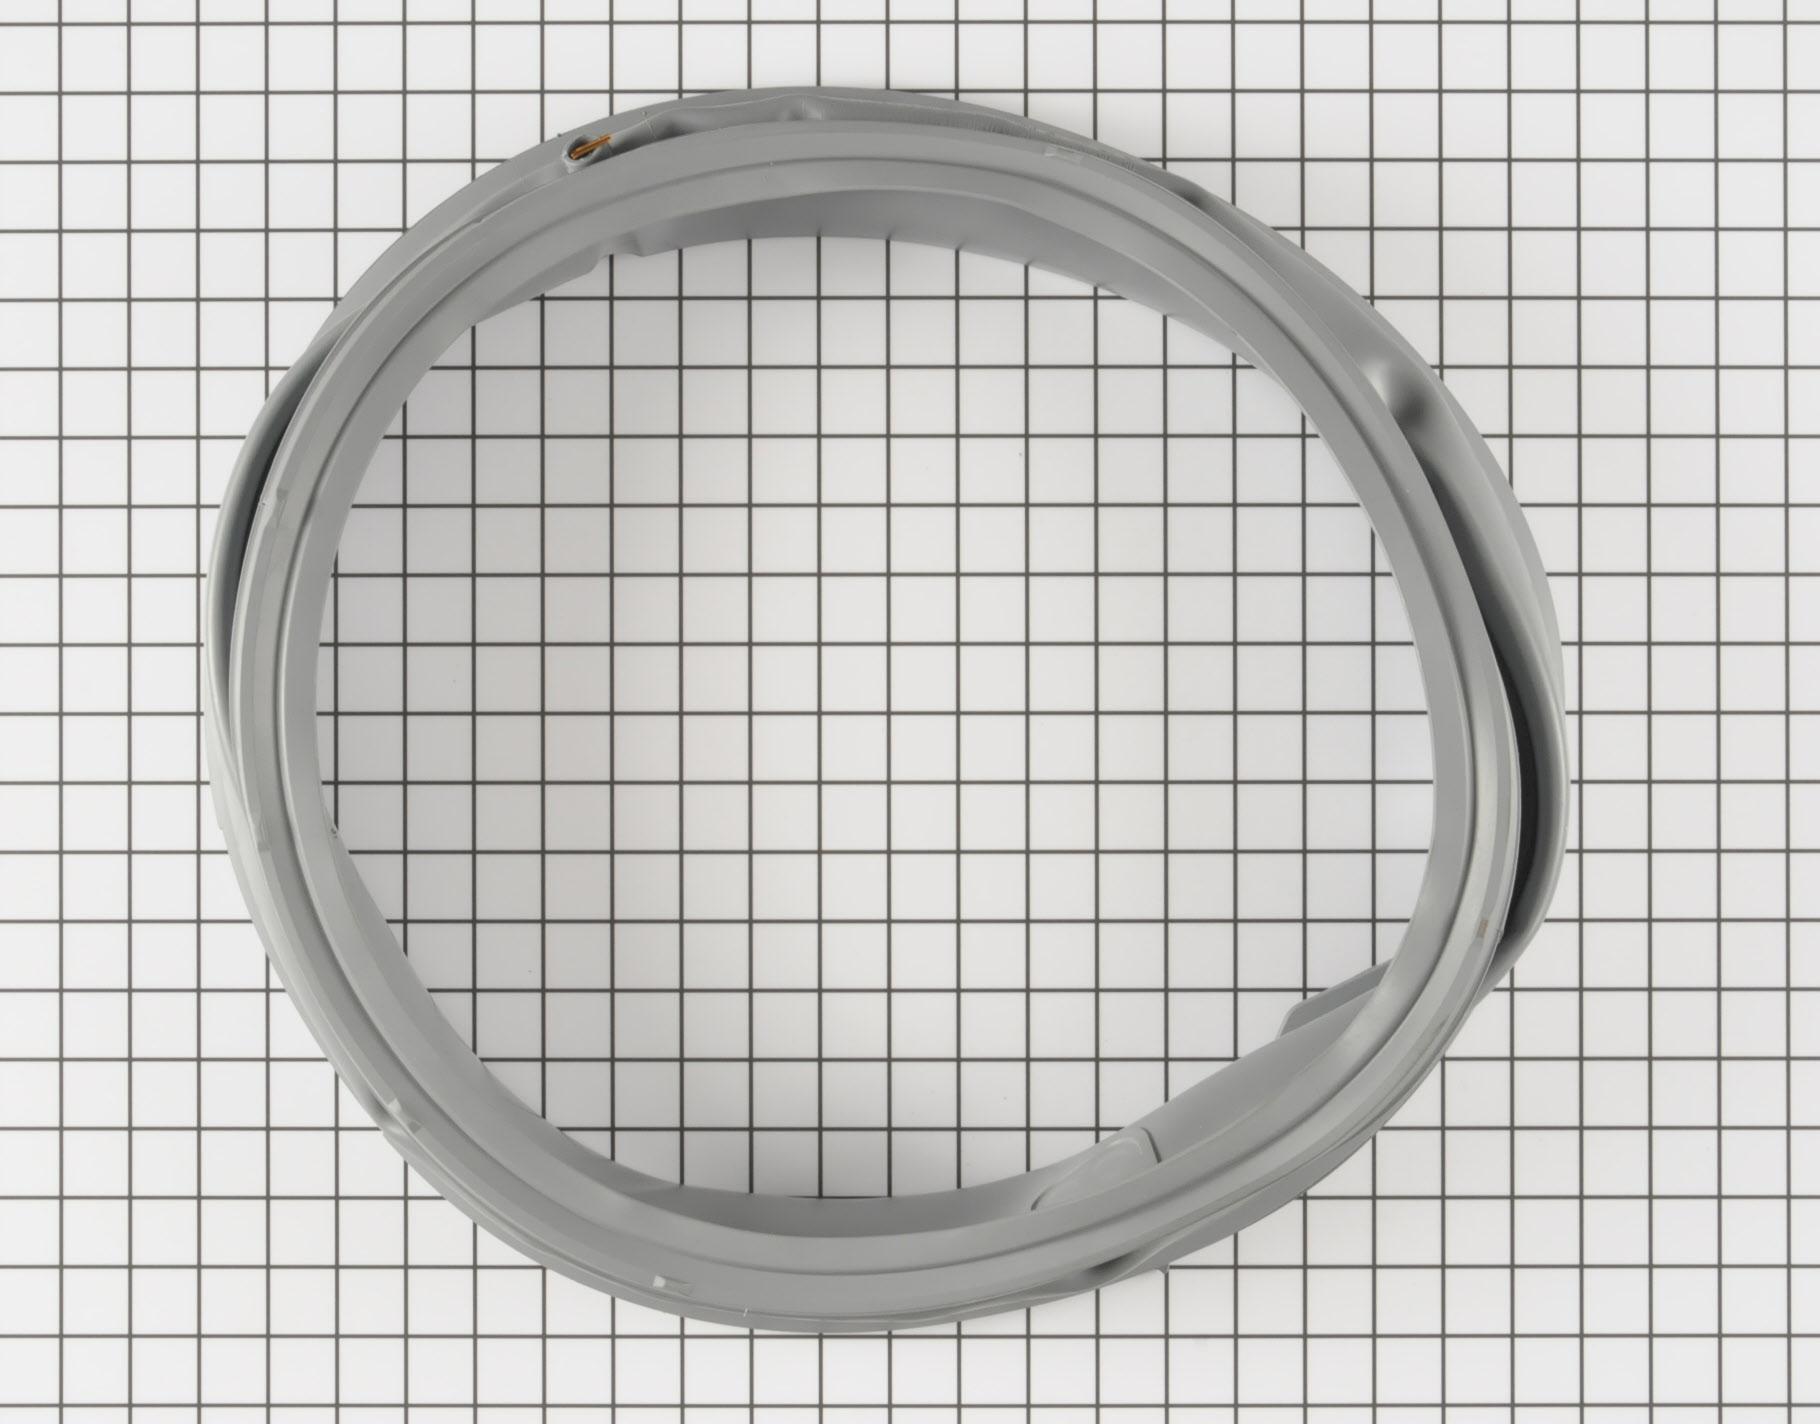 LG Washing Machine Part # 4986ER0001D - Door Boot Seal